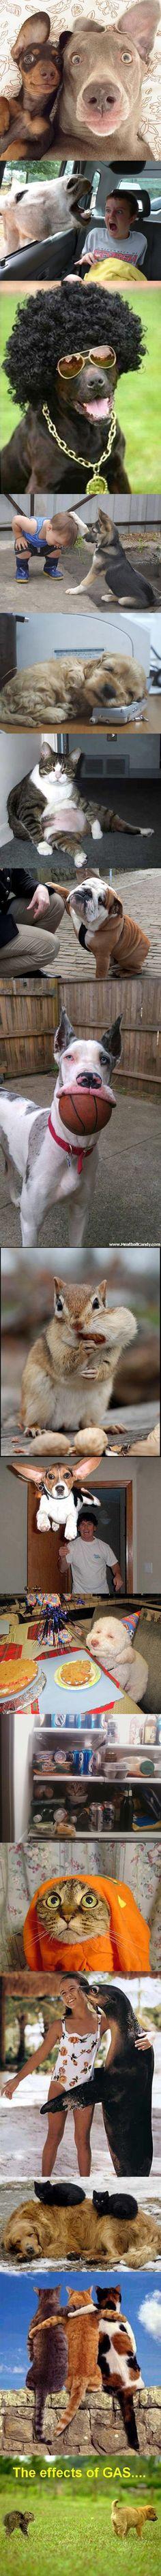 Funny Animal LoL ...